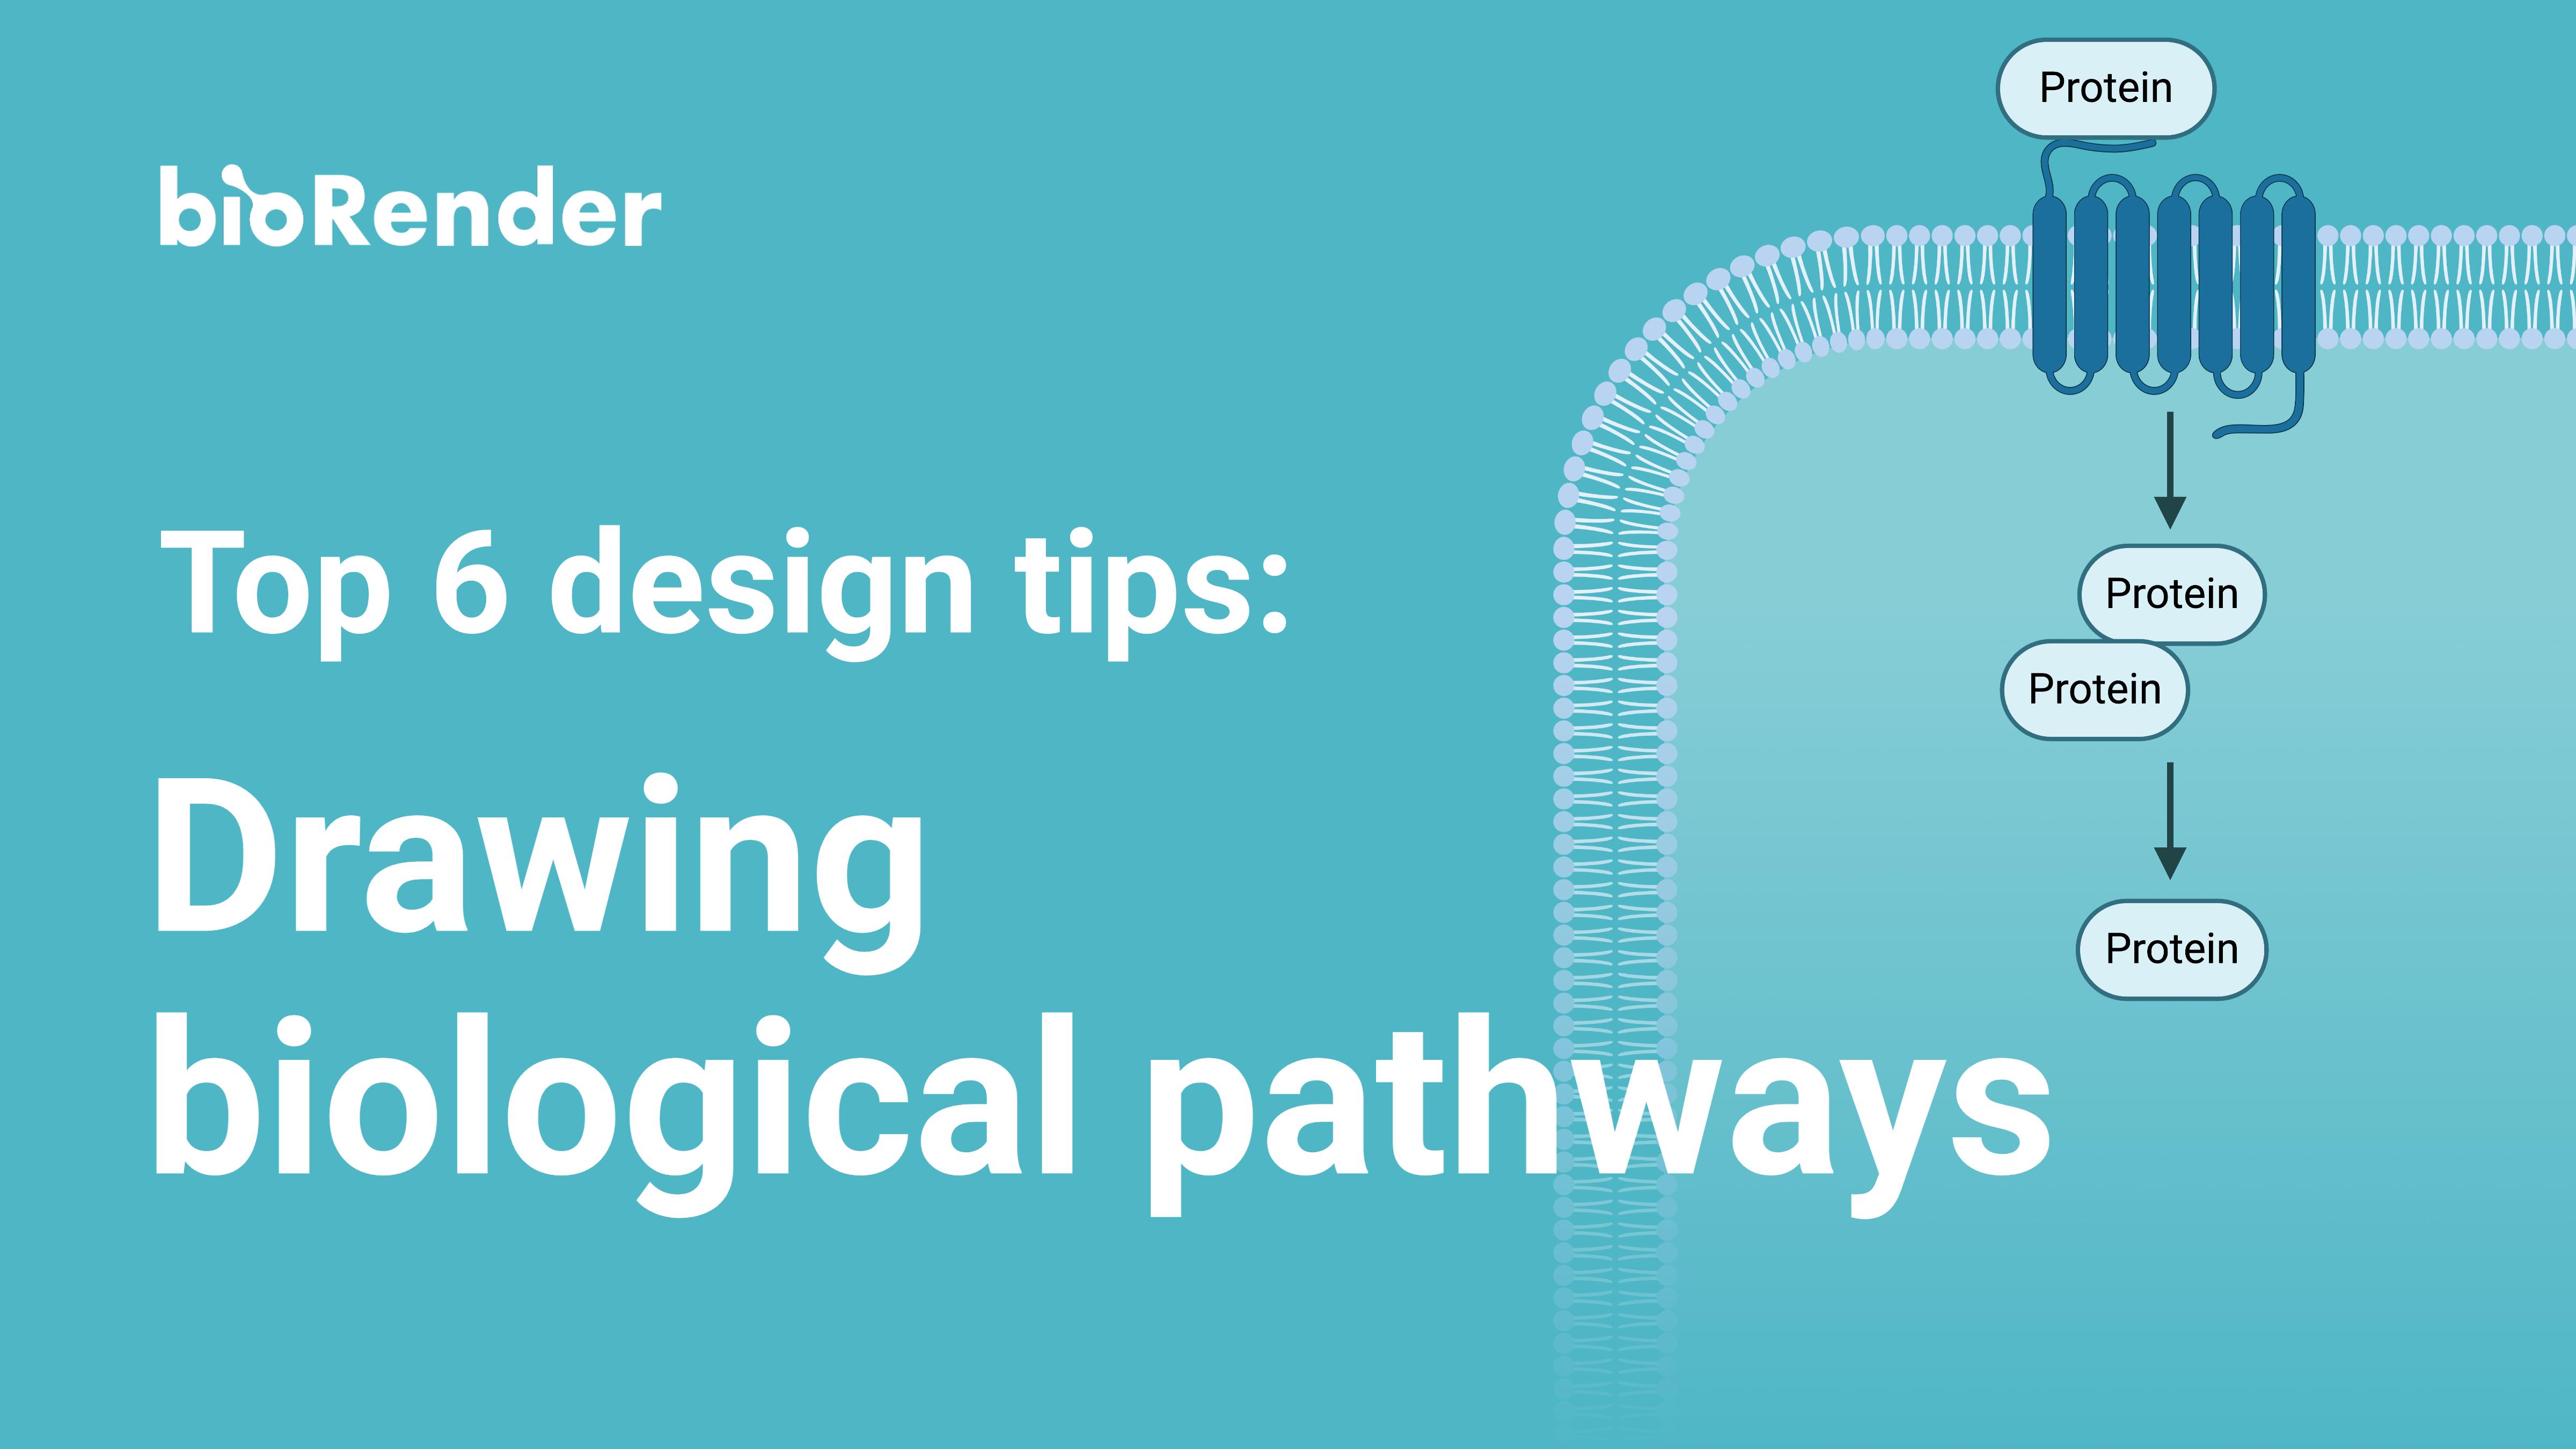 Tips for Illustrating Biological Pathways